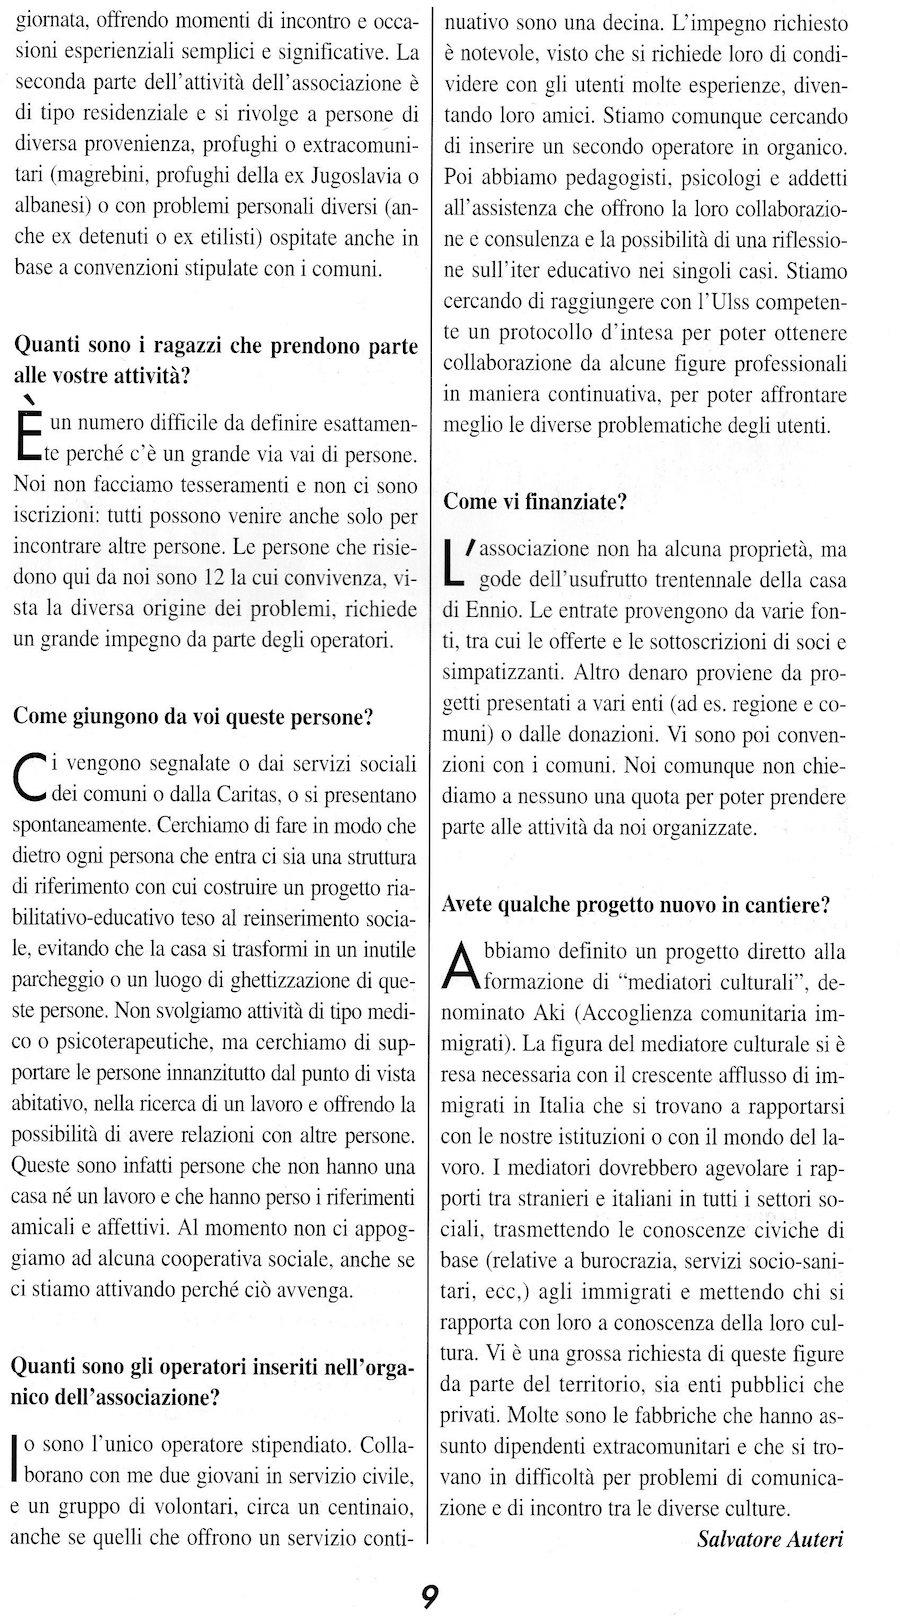 1998.03-04 Il Sestante (p. 9)